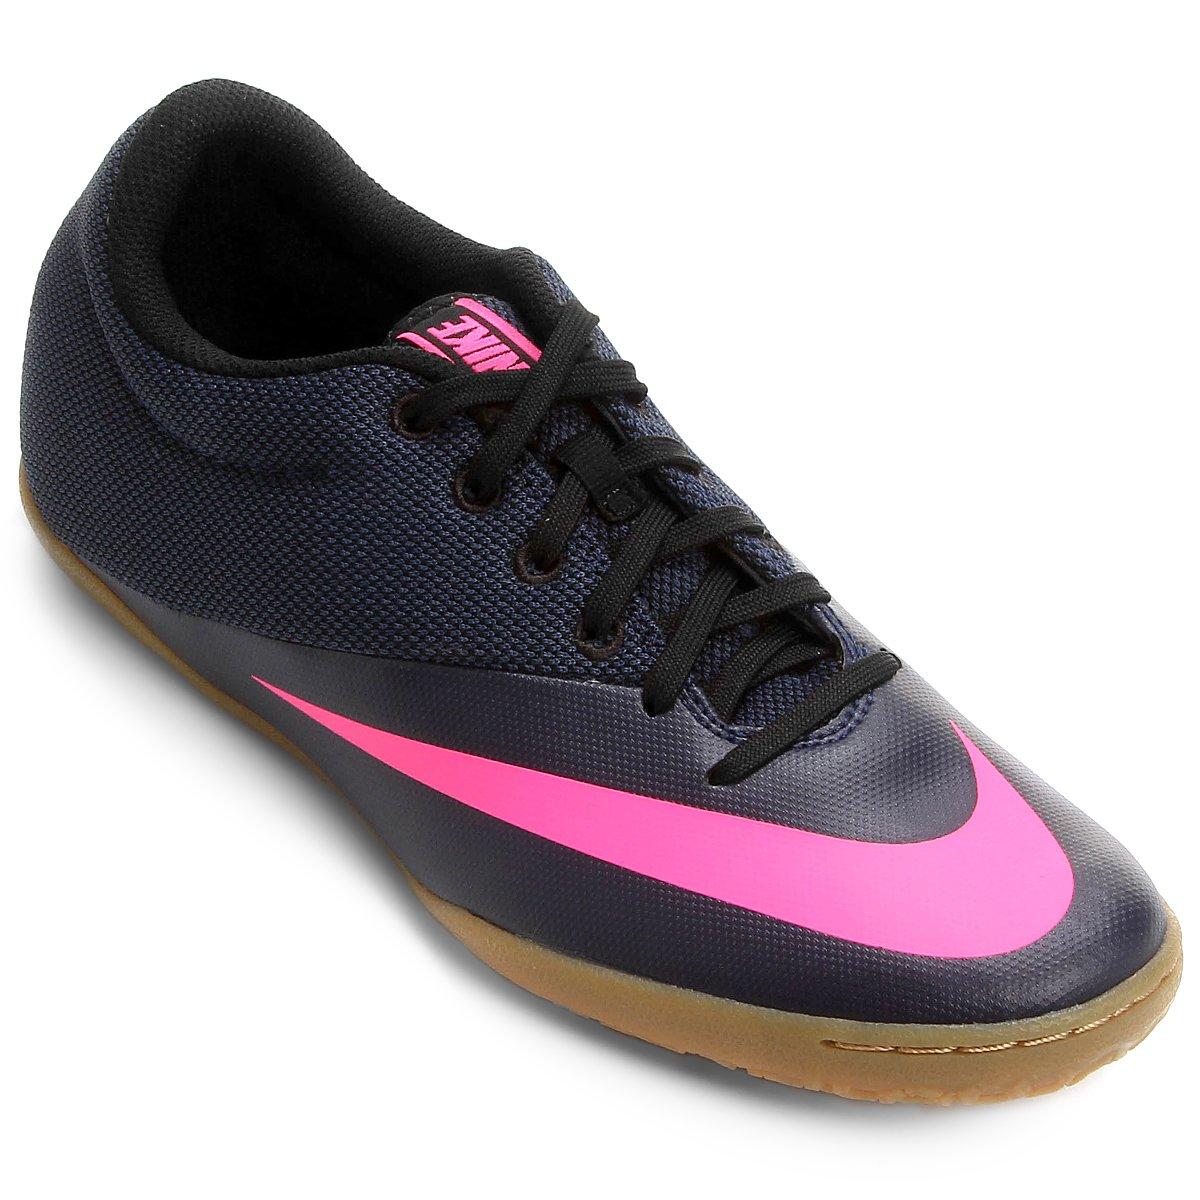 14af339139a0b Chuteira Nike Mercurial Pro IC Futsal - Compre Agora